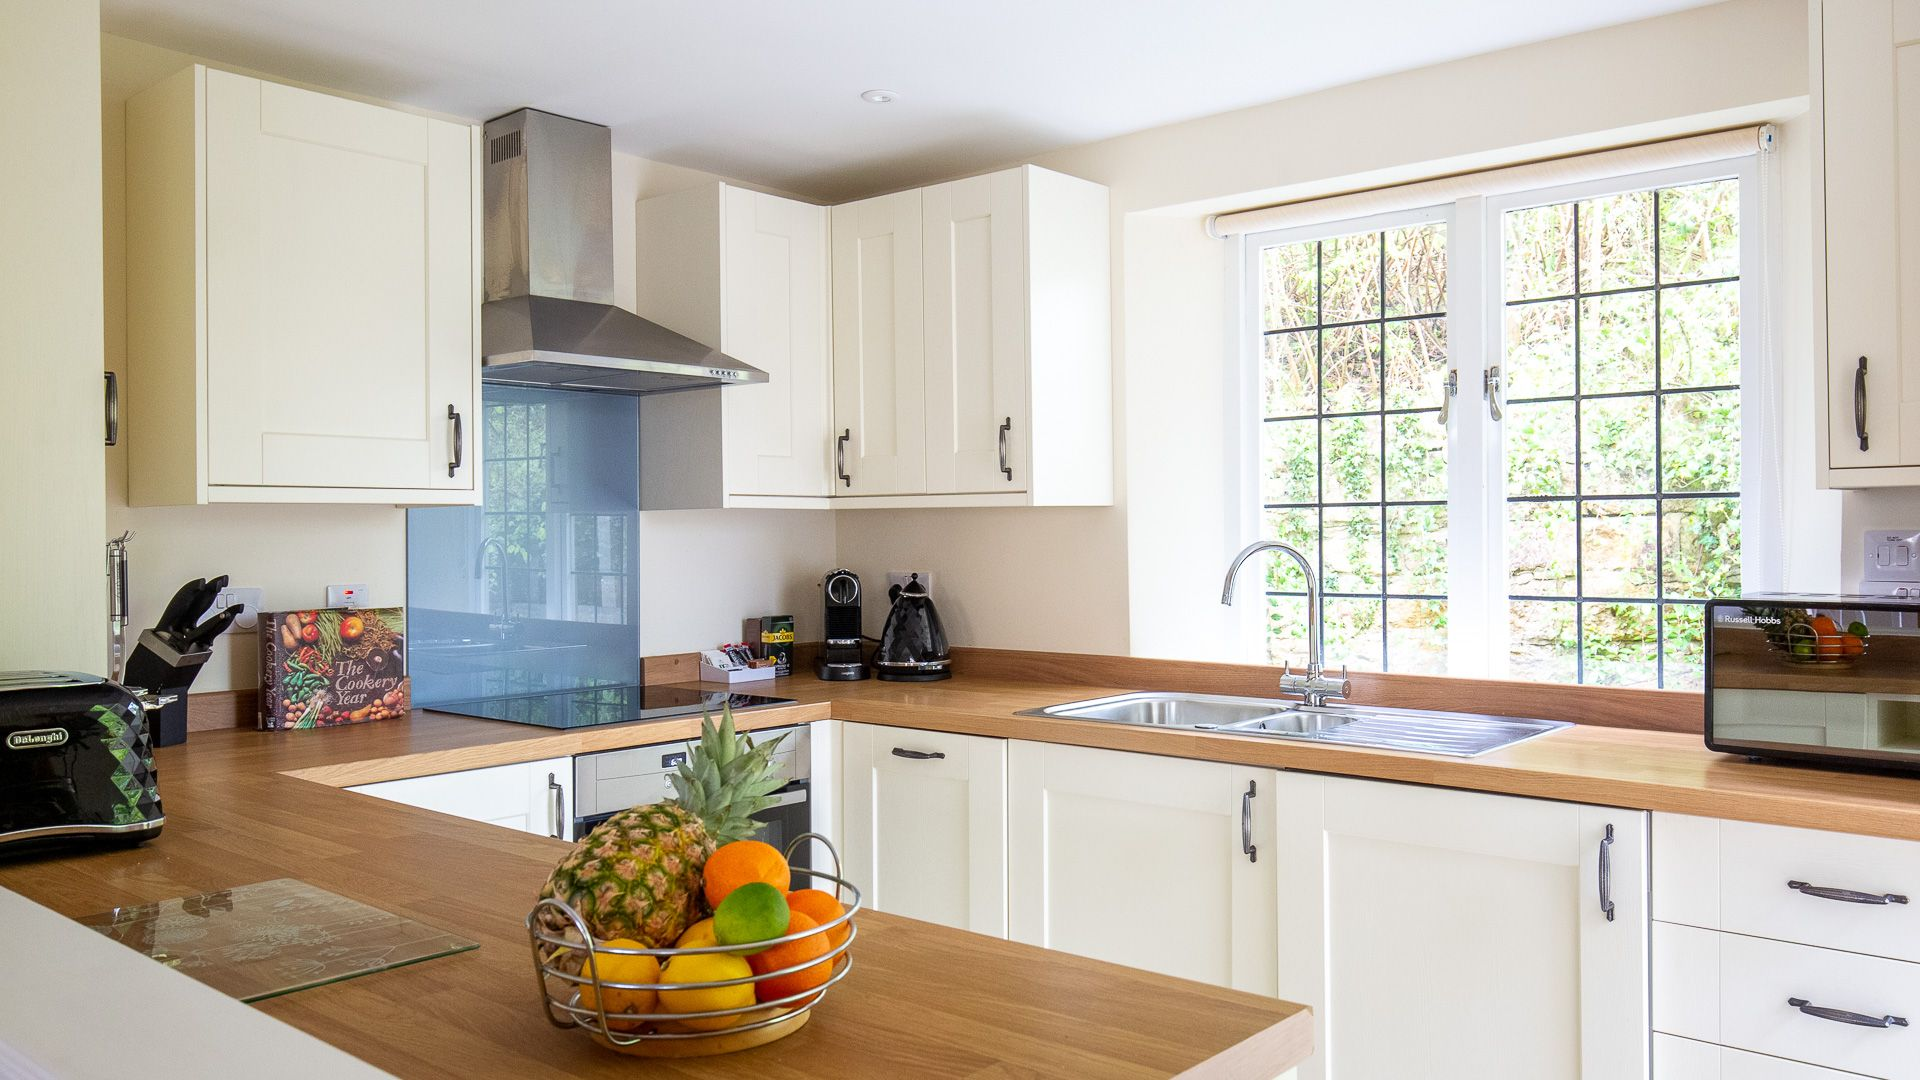 Kitchen, Emma Dent Cottage at Sudeley Castle, Bolthole Retreats